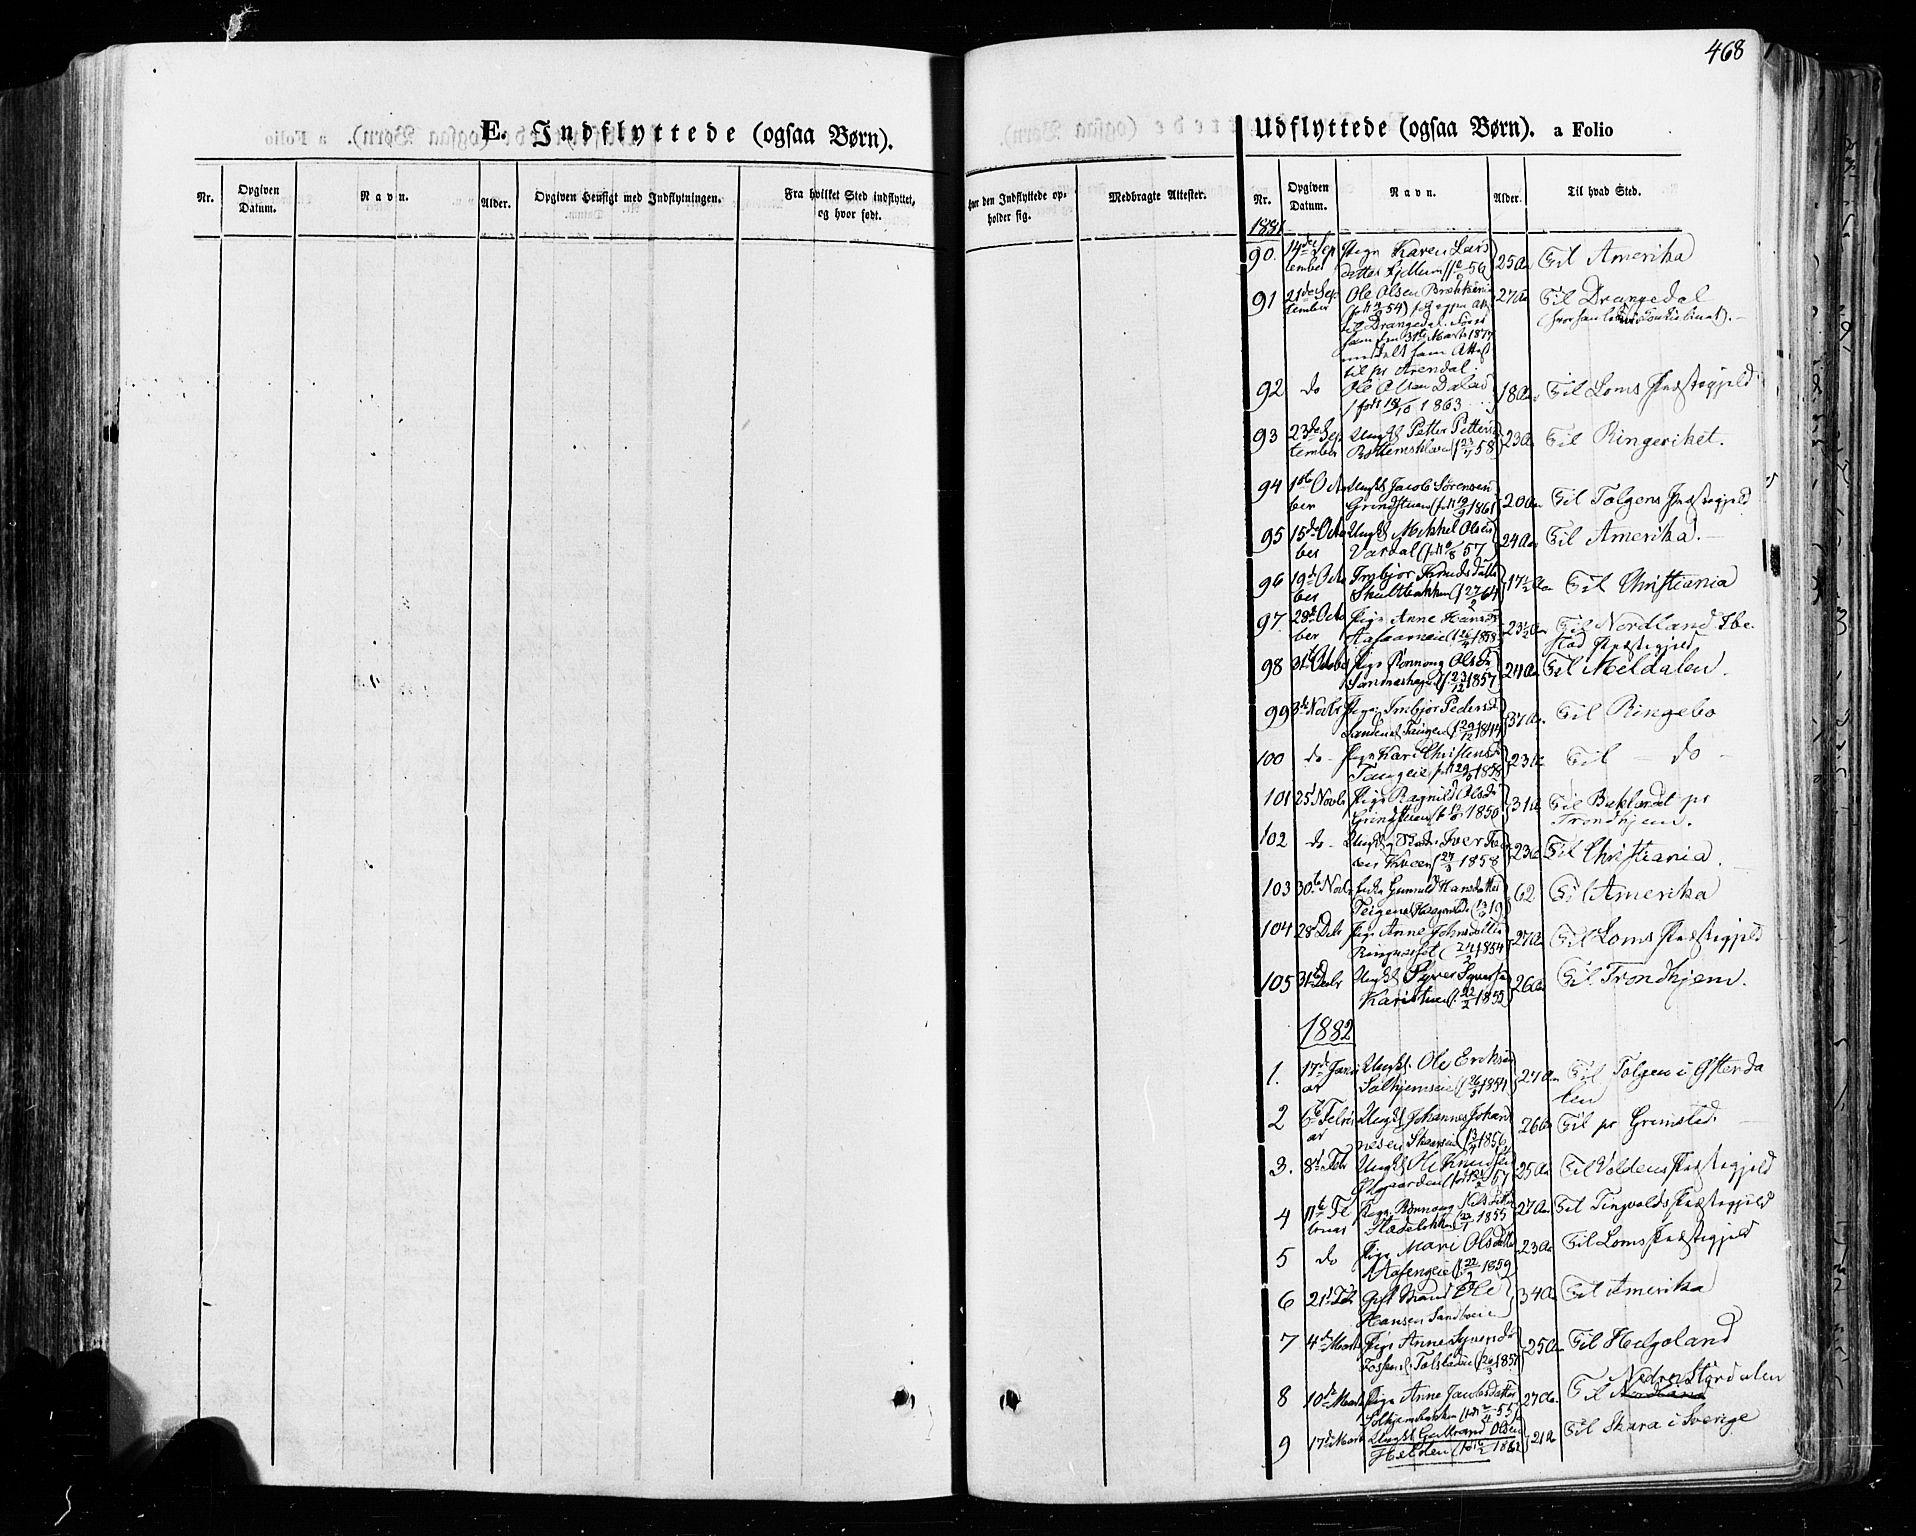 SAH, Vågå prestekontor, Ministerialbok nr. 7 /1, 1872-1886, s. 468